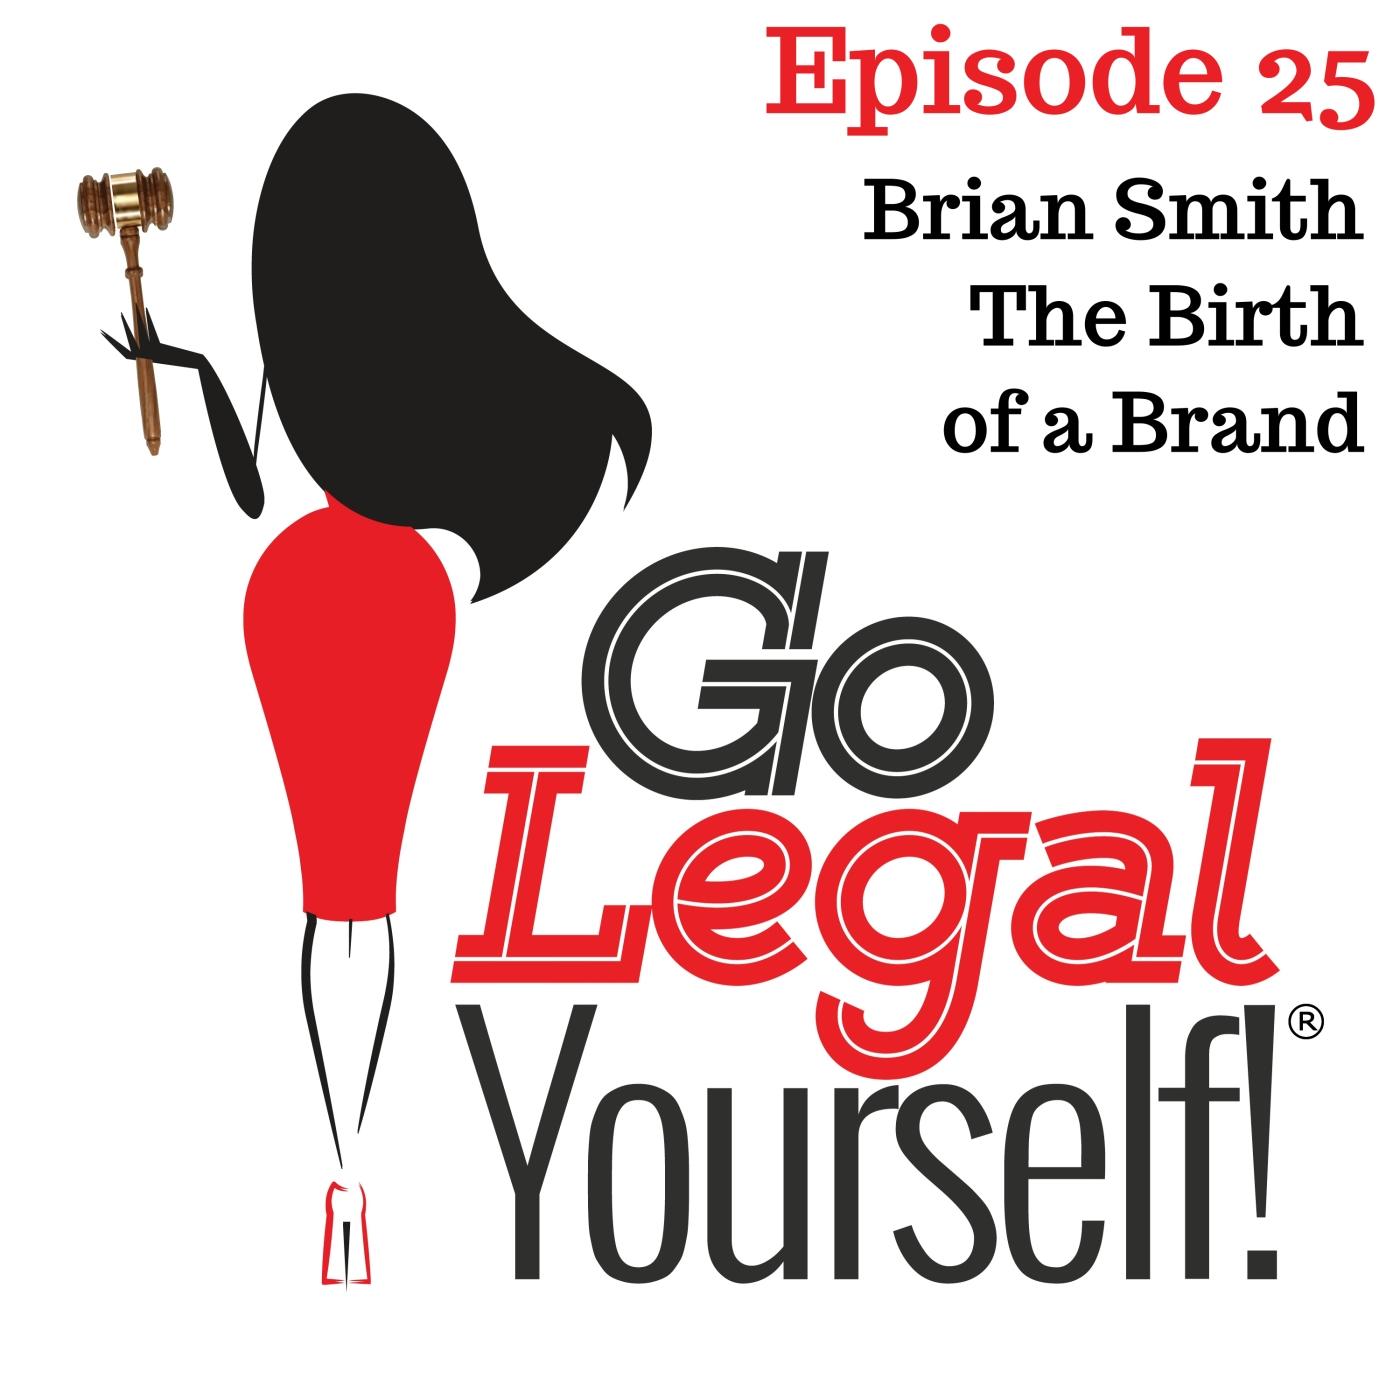 Ep. 25 Brian Smith: The Birth of a Brand